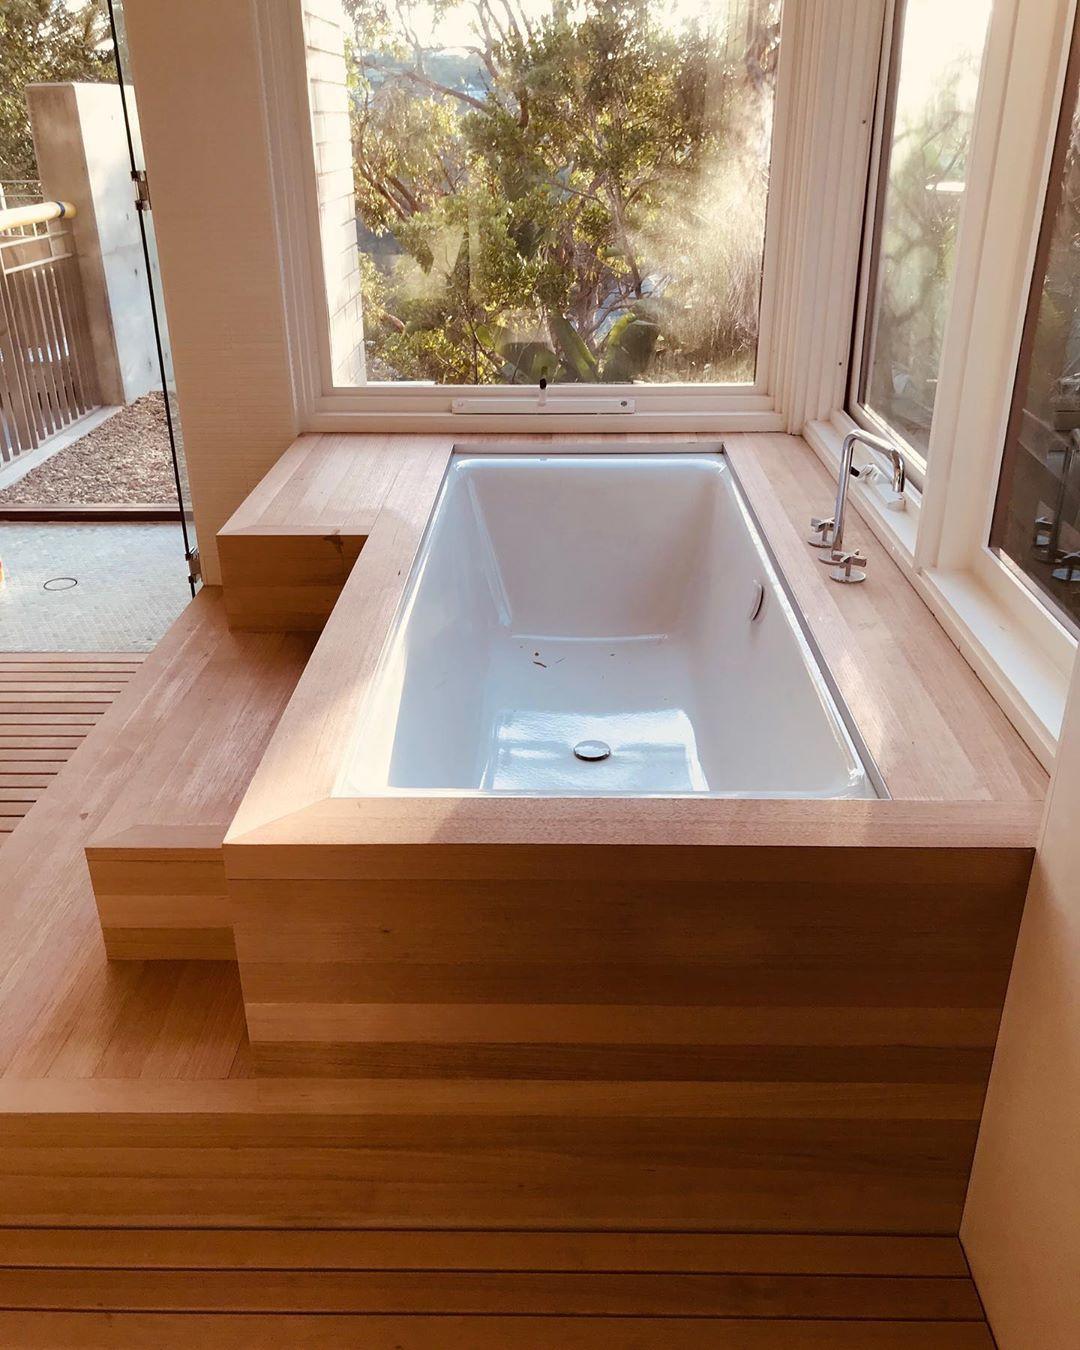 54 Luxury Bathrooms You Can Copy From Them,#luxurybathroom#modernbathroom#showerdesign#bathroomdesign#bathroomvanity#bathroomdecor#masterbathroom#bathroomstyle#bathroominspiration#bathroomsofinstagram